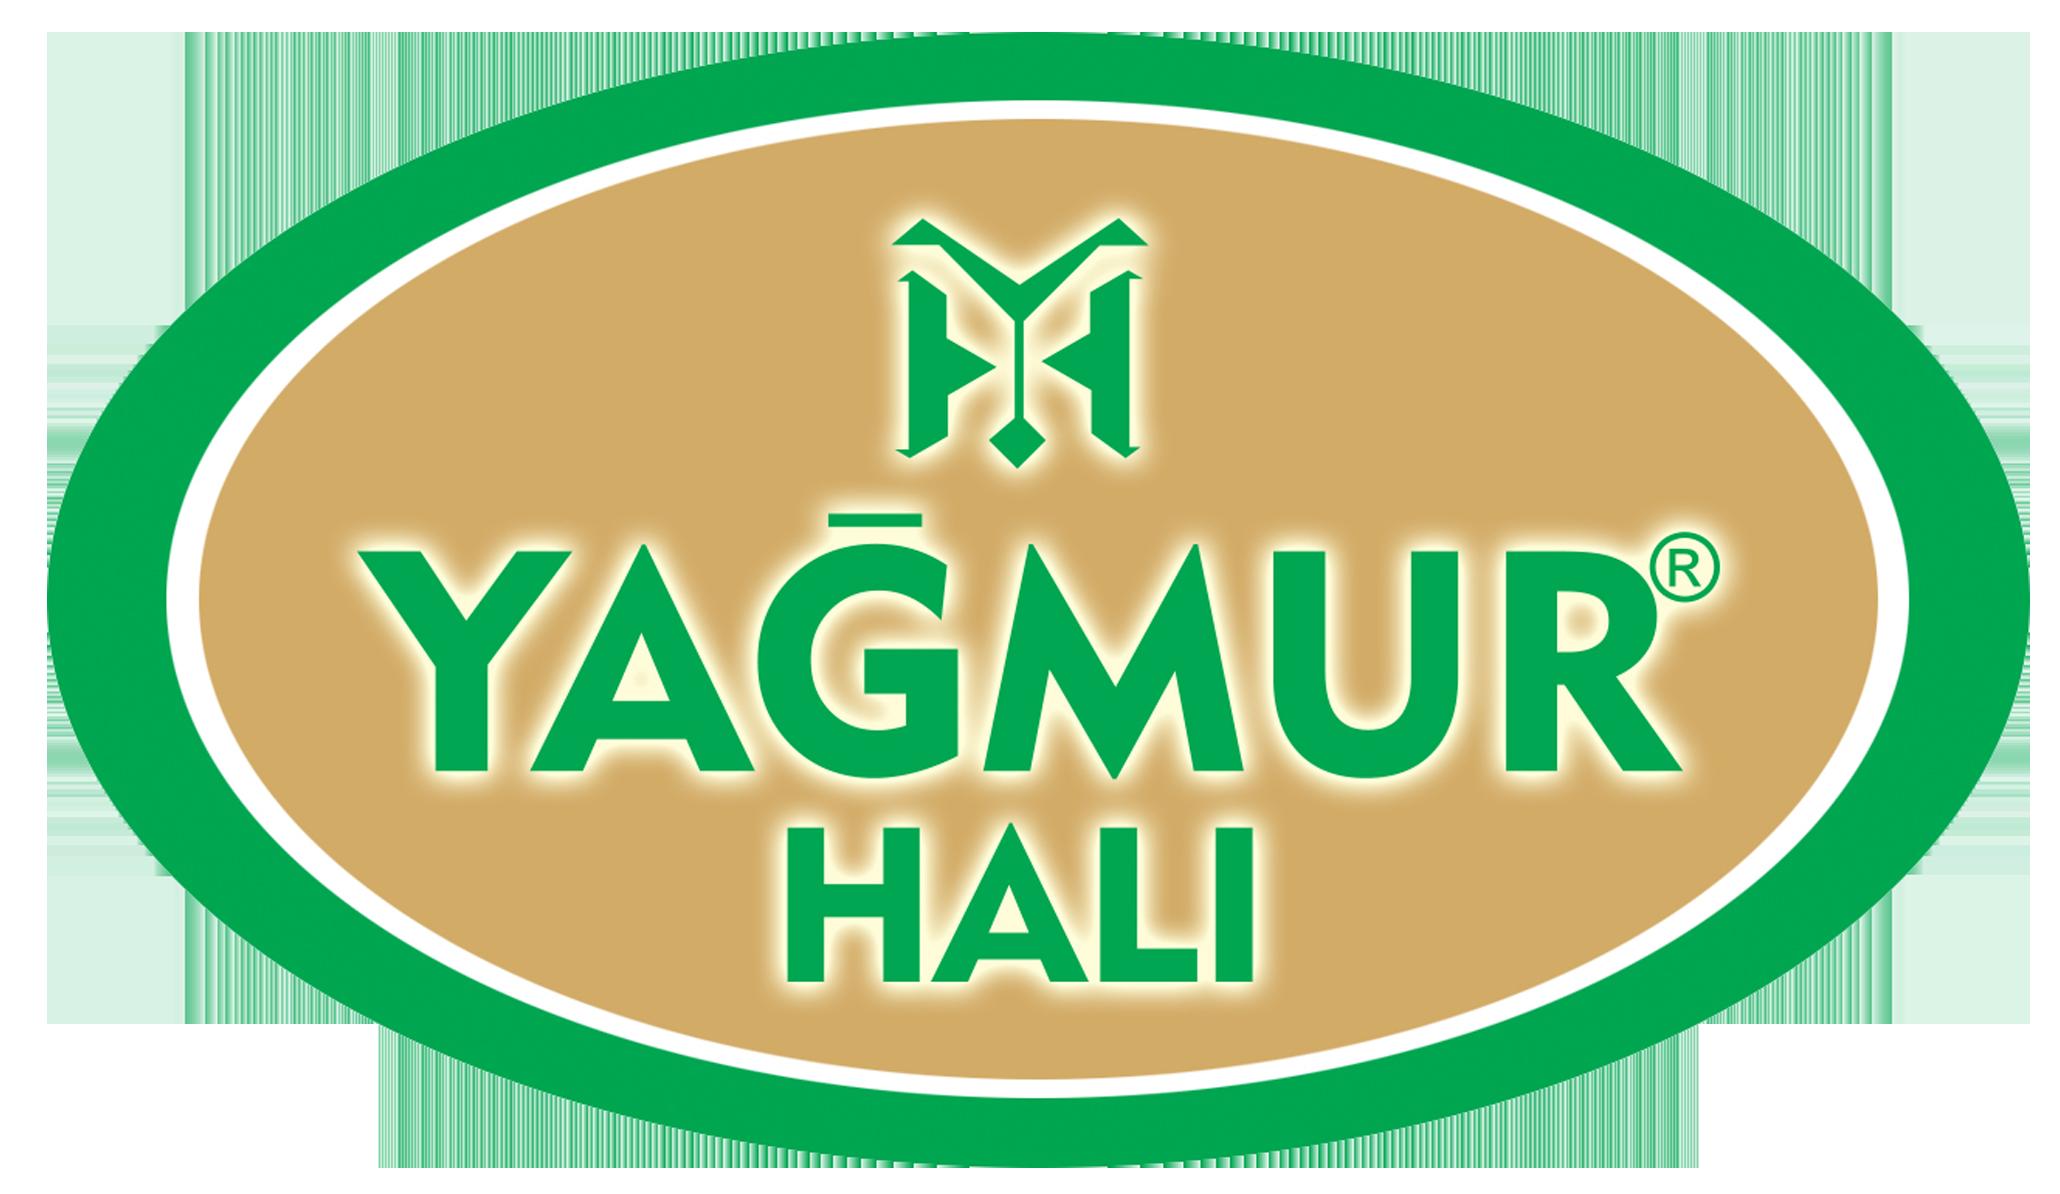 yagmur_logo1